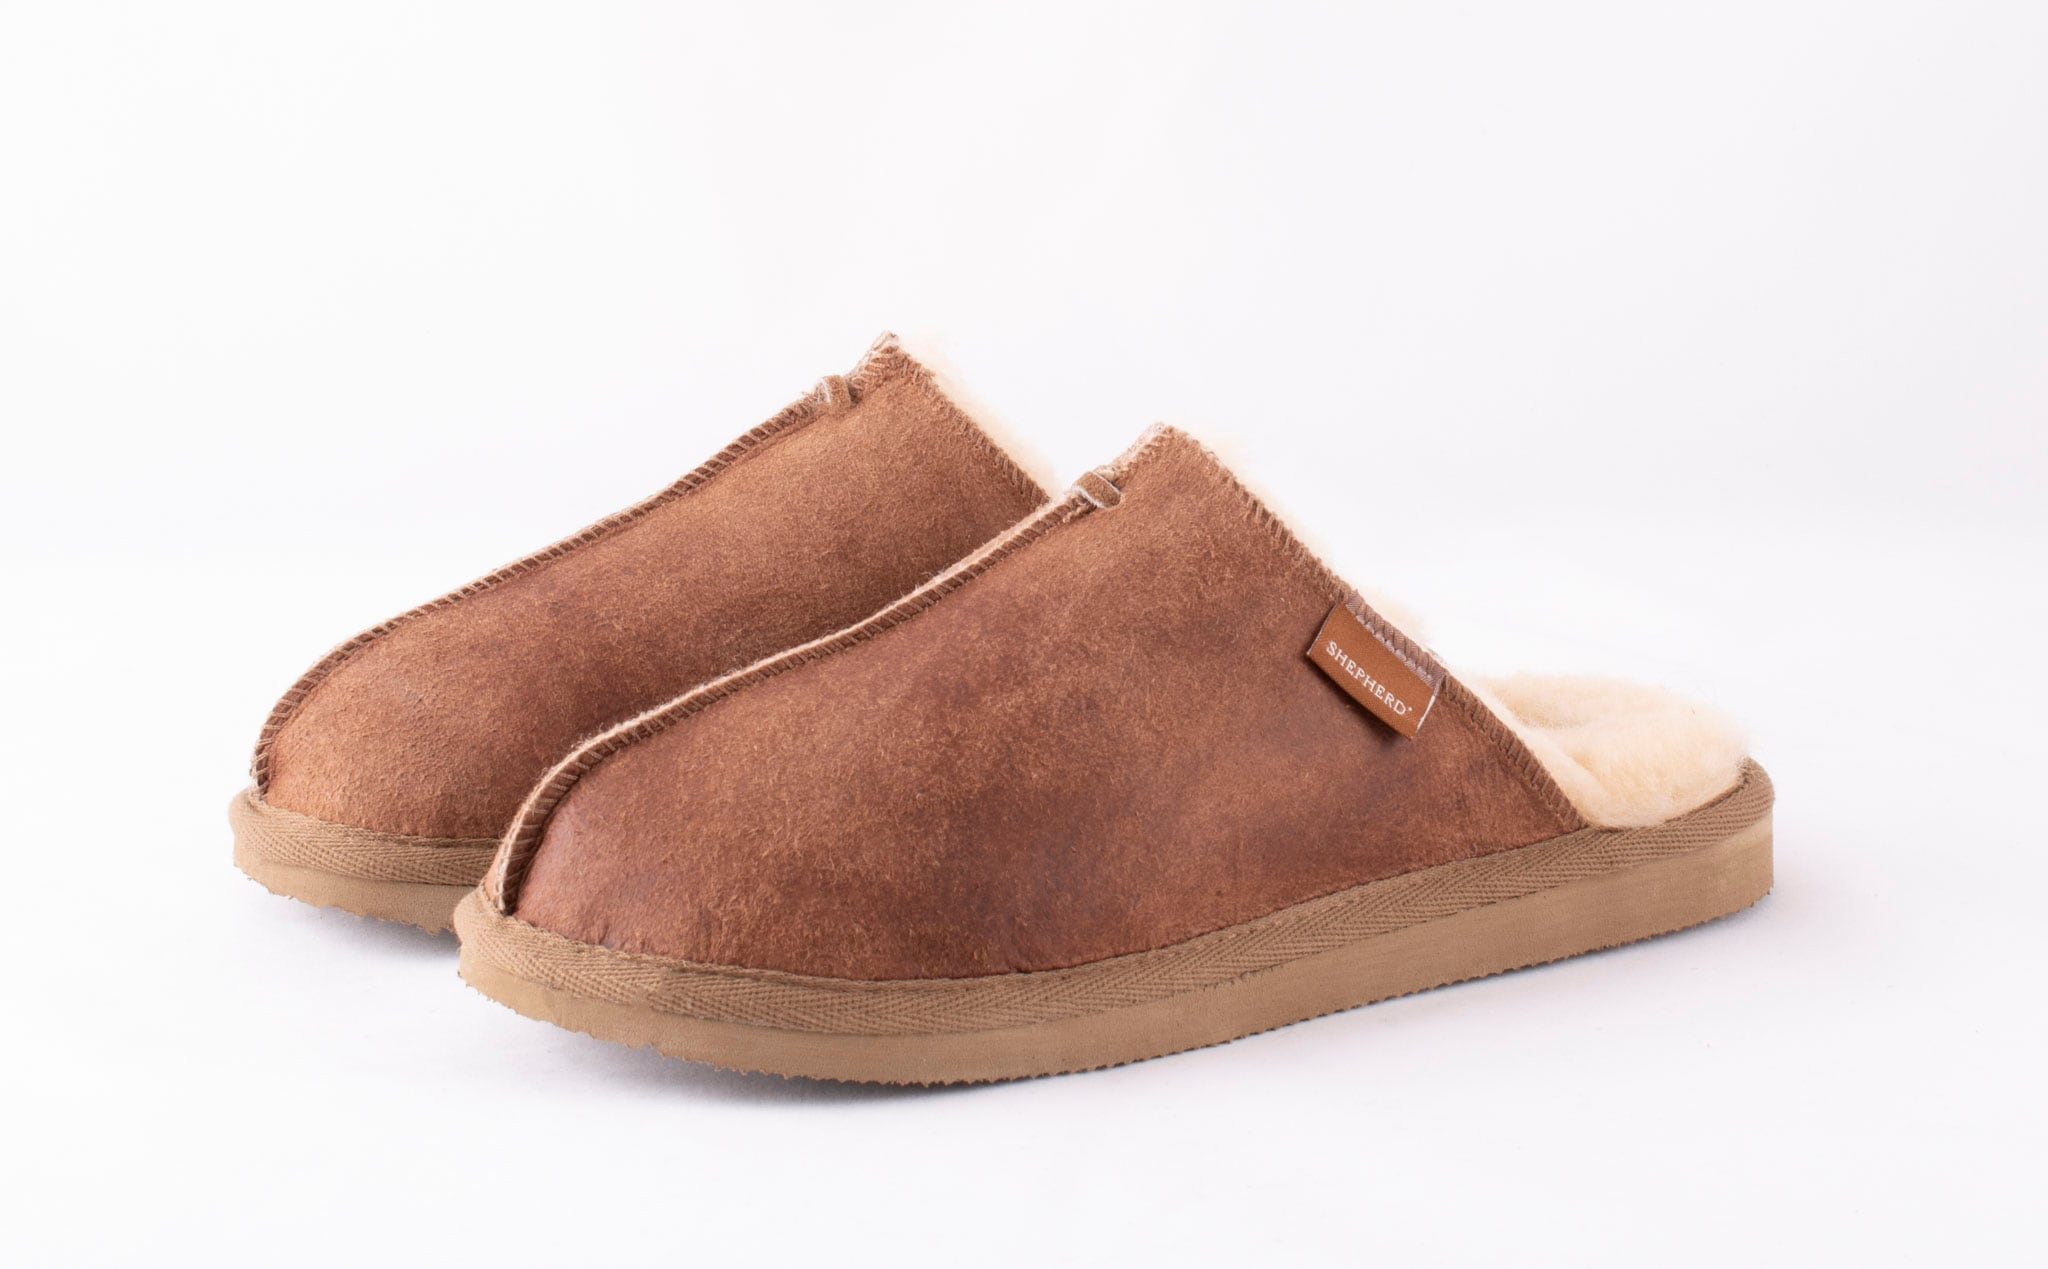 Shepherd Karla sheepskin slippers